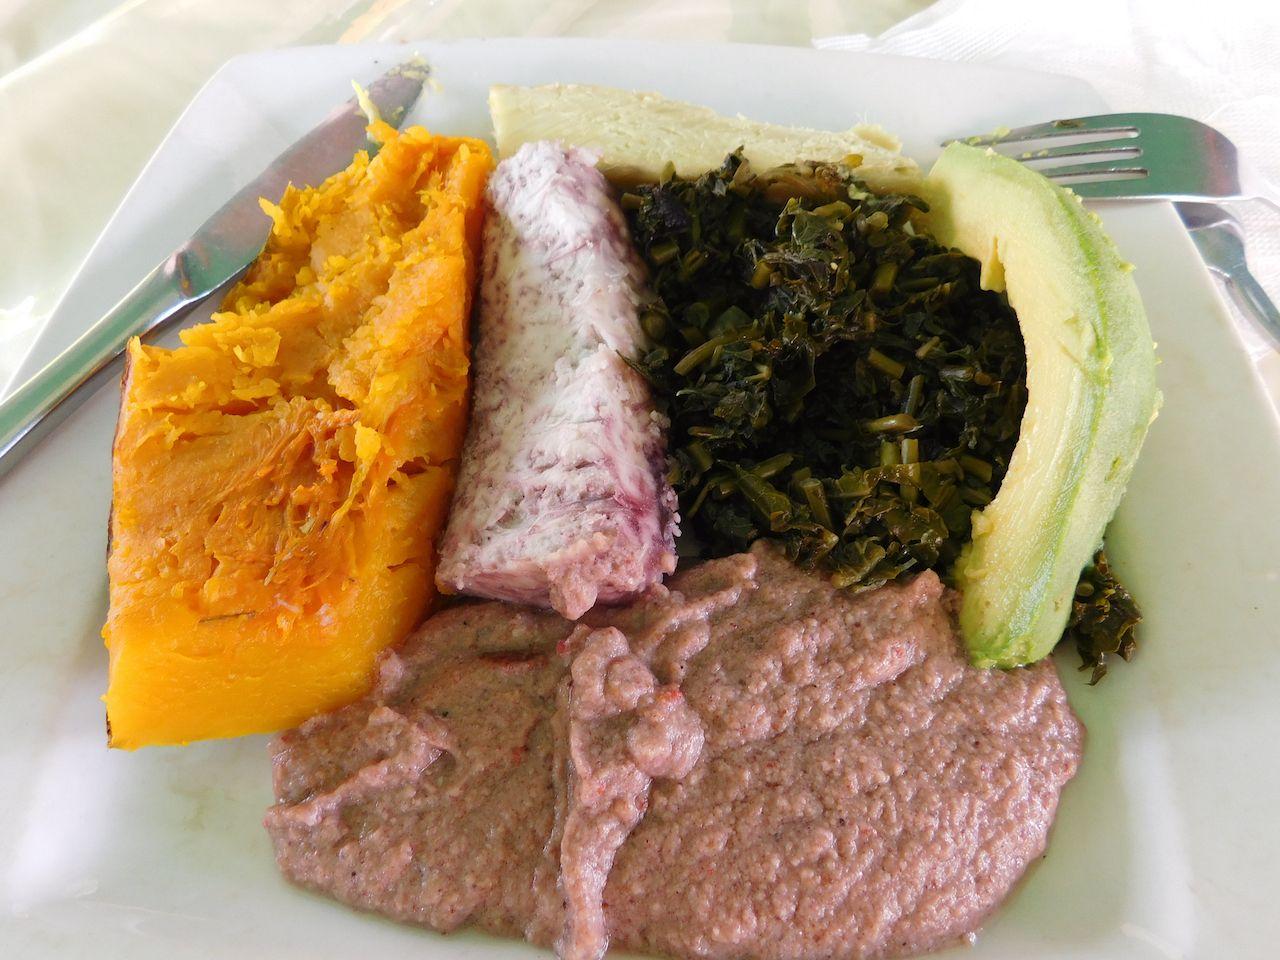 Banana dishes from Uganda like matooke